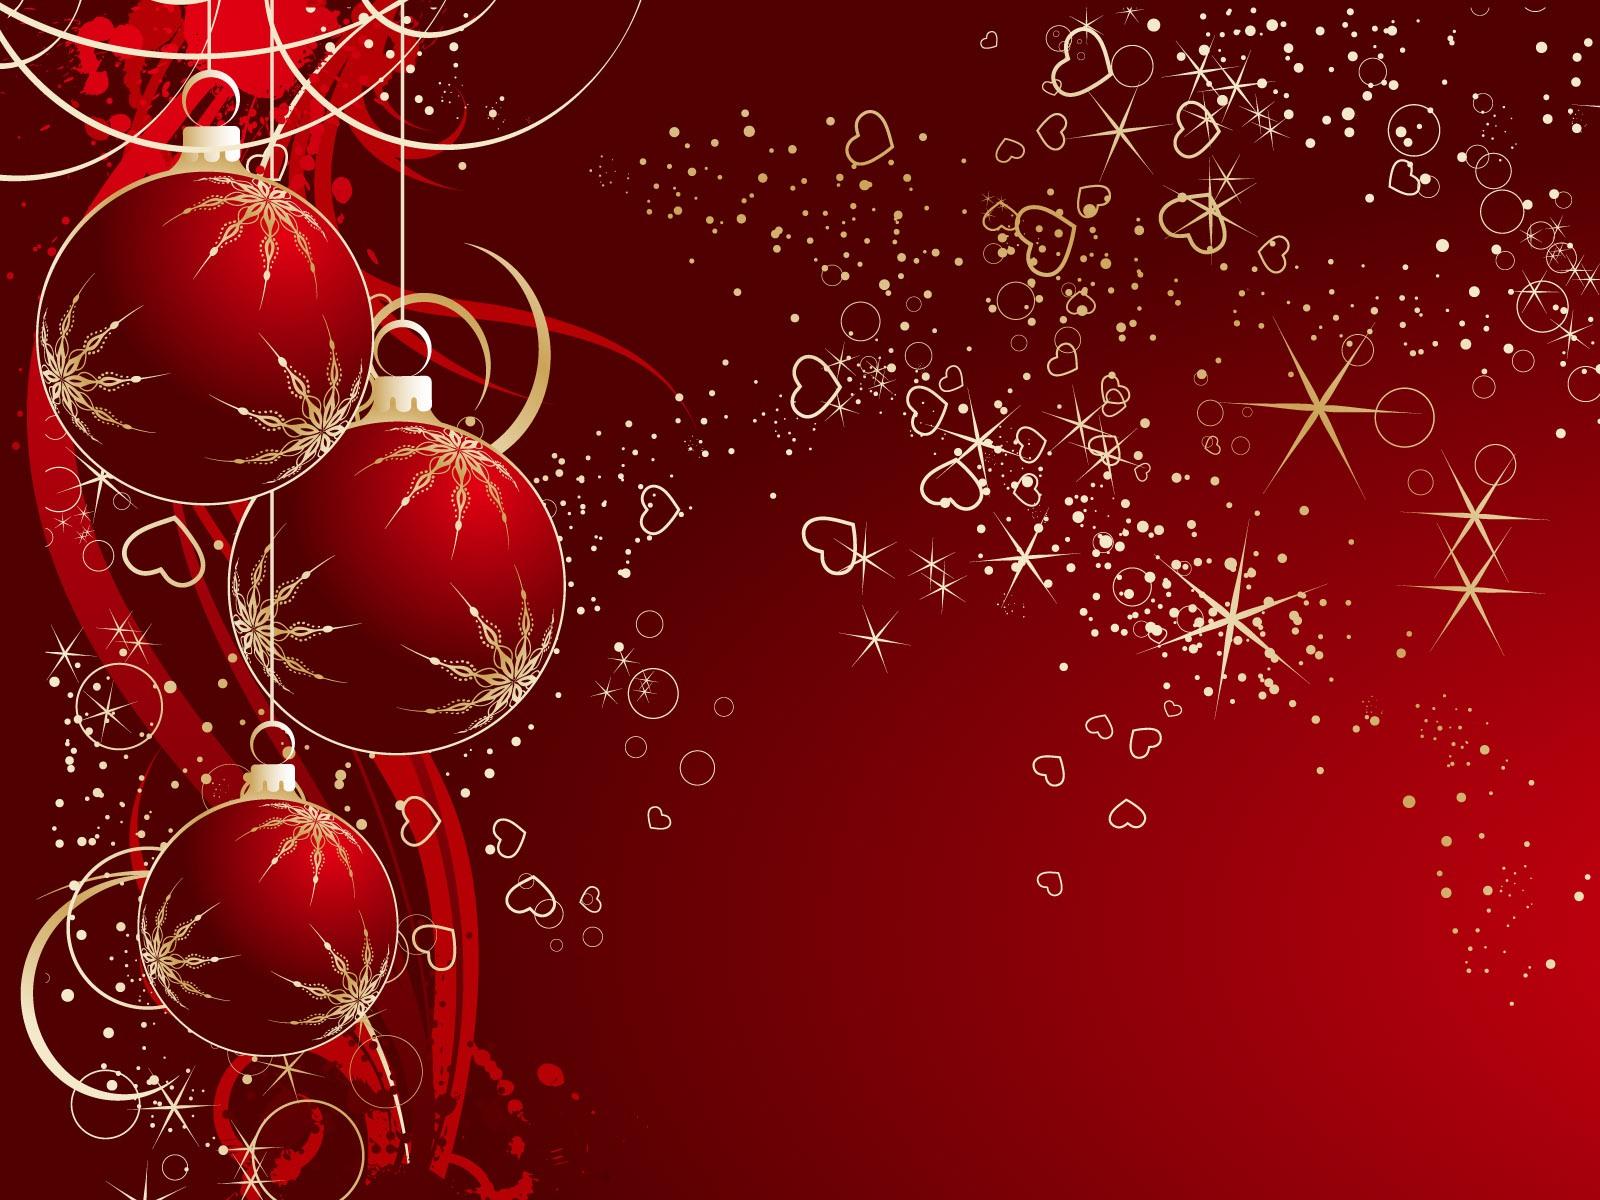 Wallpaper World: Christmas Wallpapers